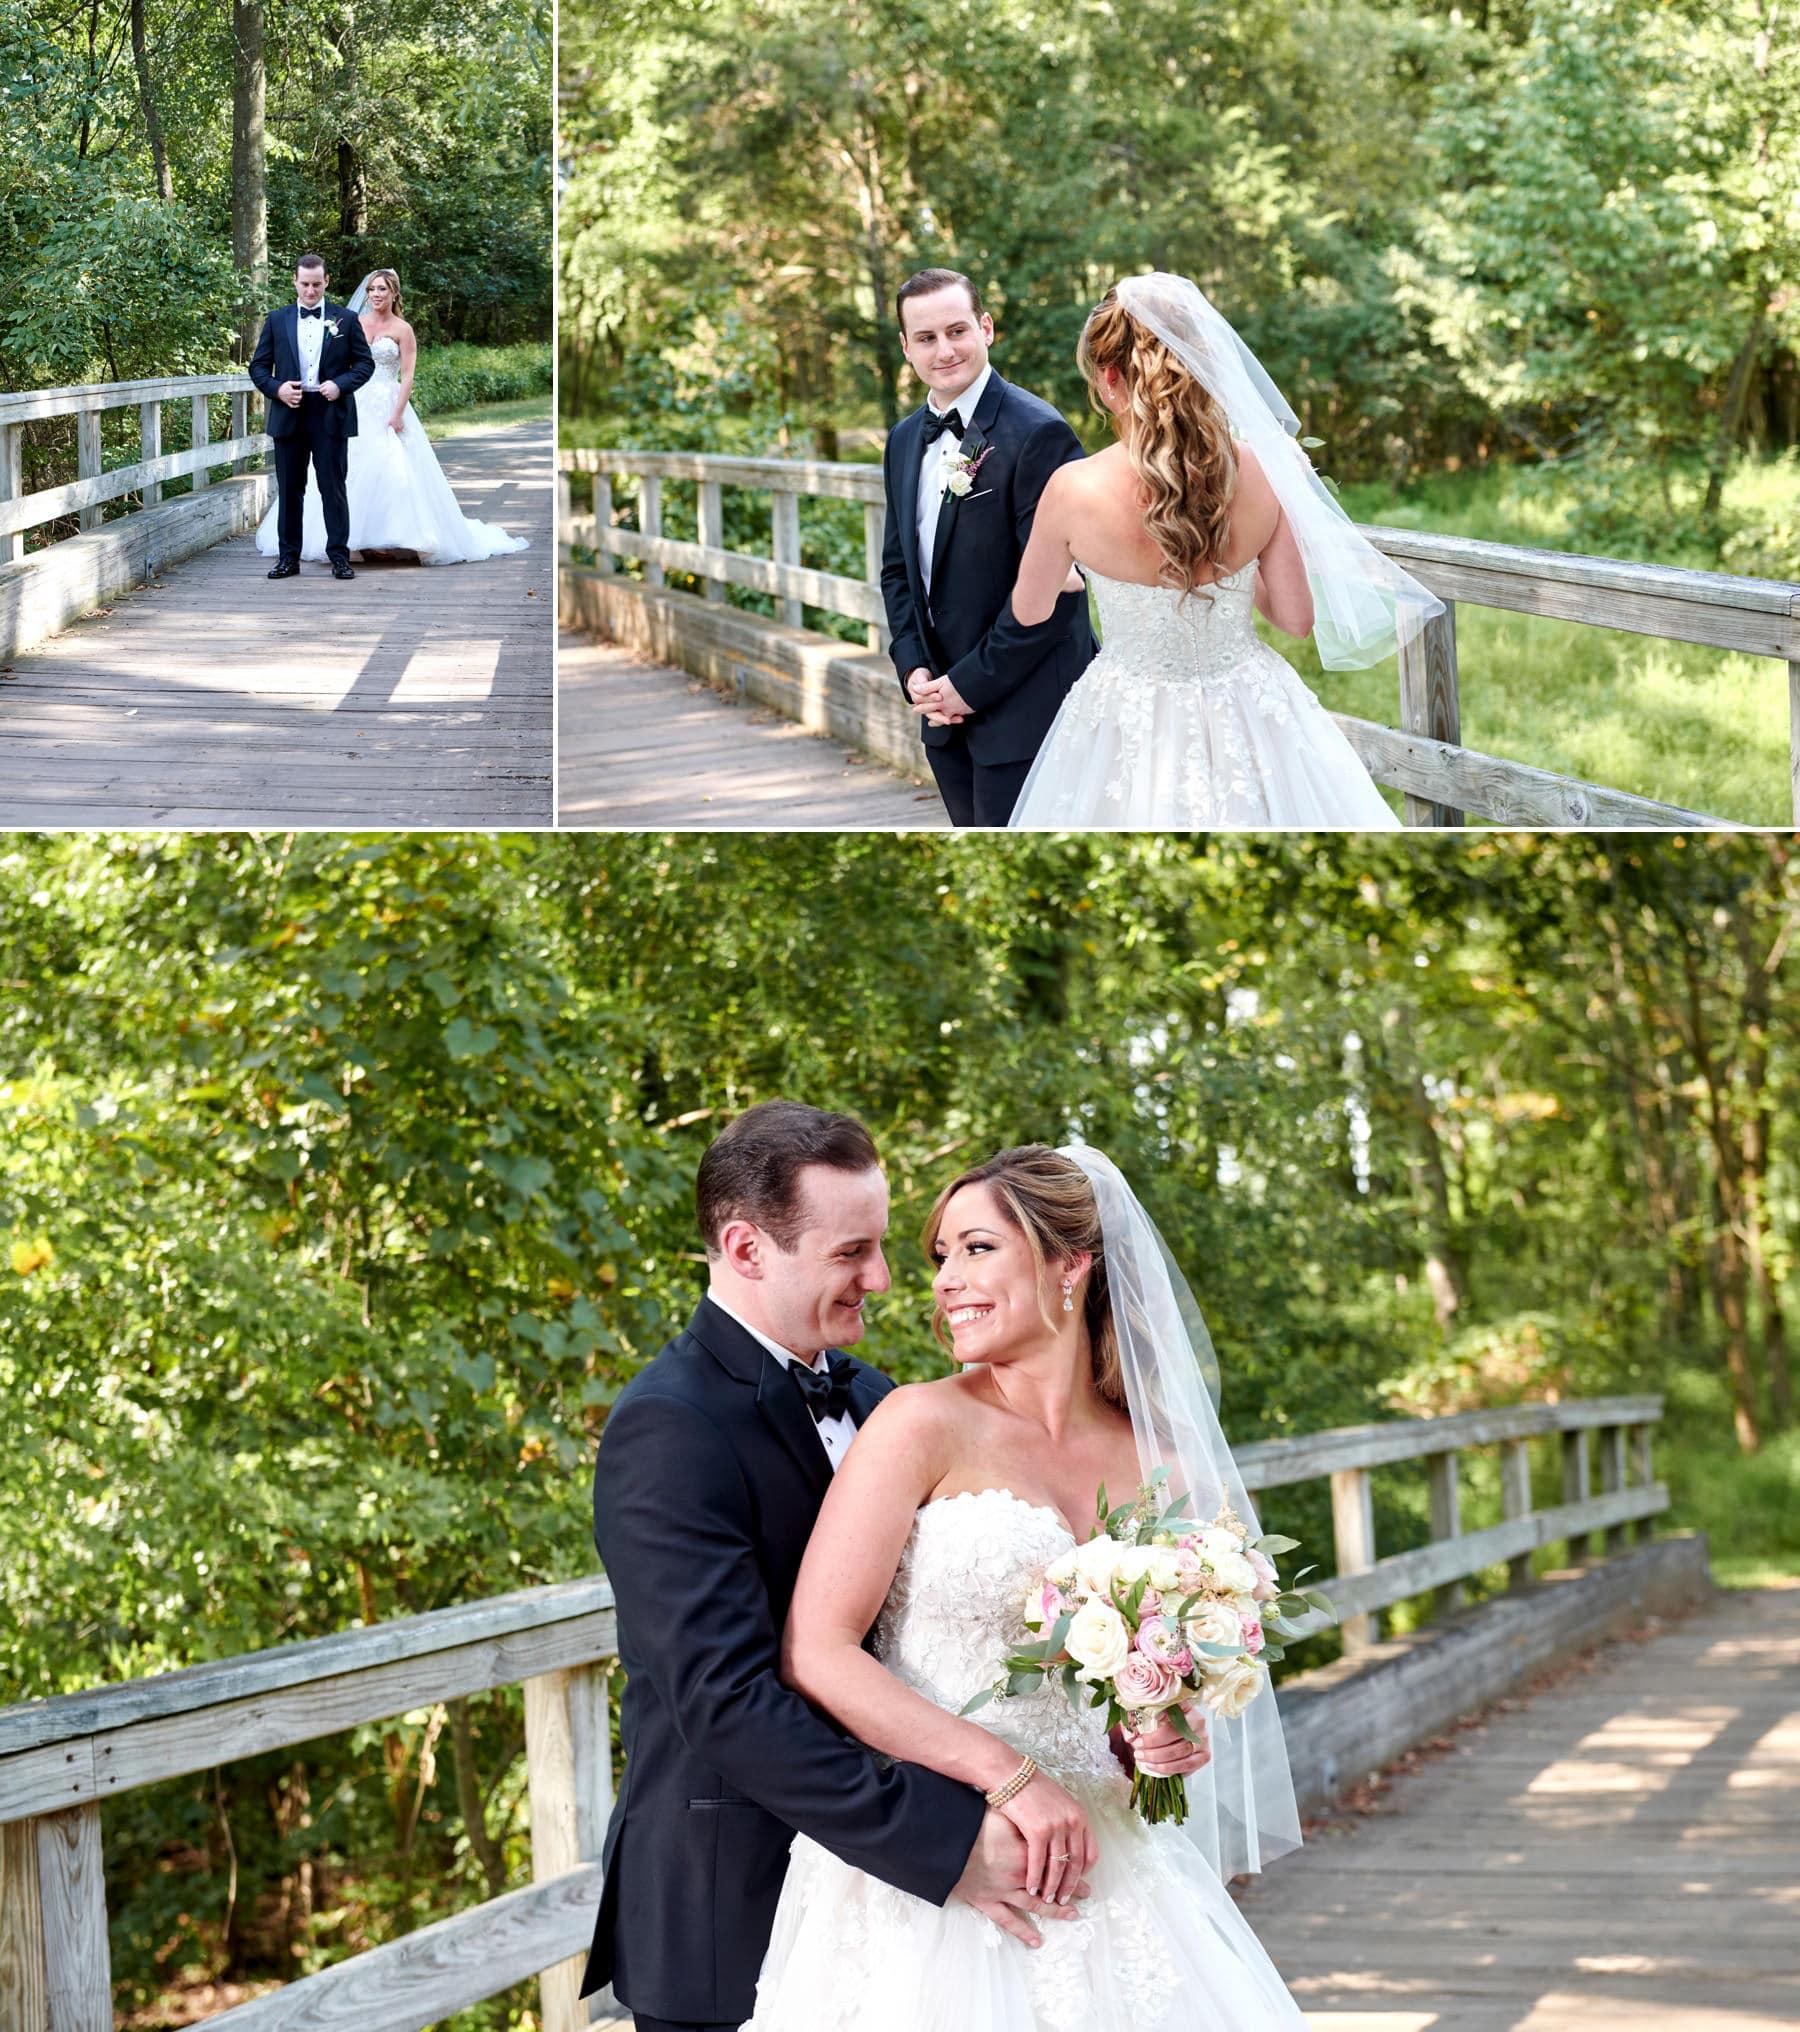 wedding first look photos at Royce Brook Golf Club